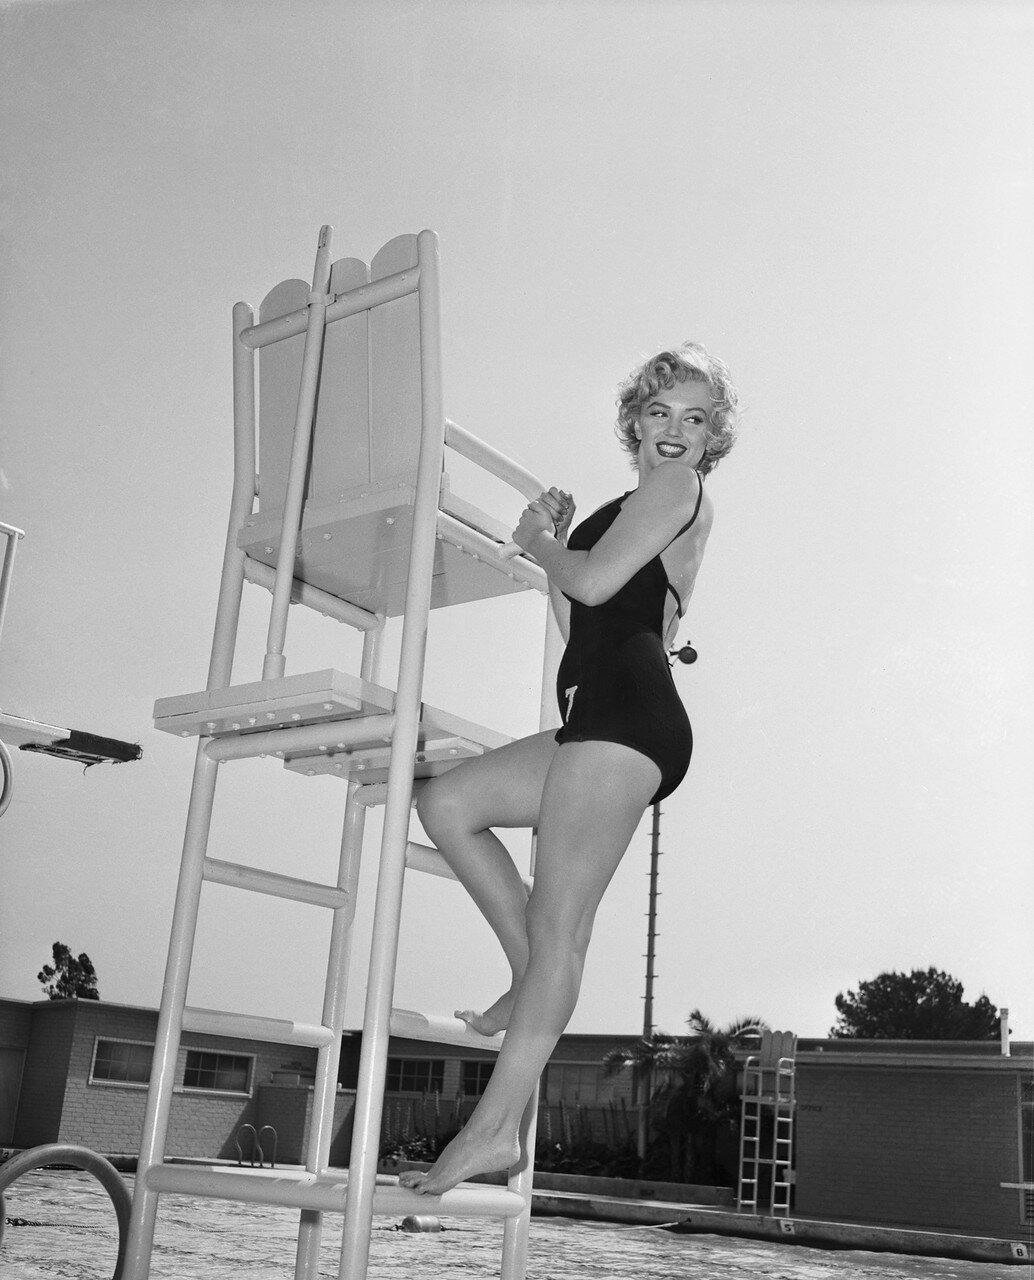 Marilyn Monroe Climbing Lifeguard Tower